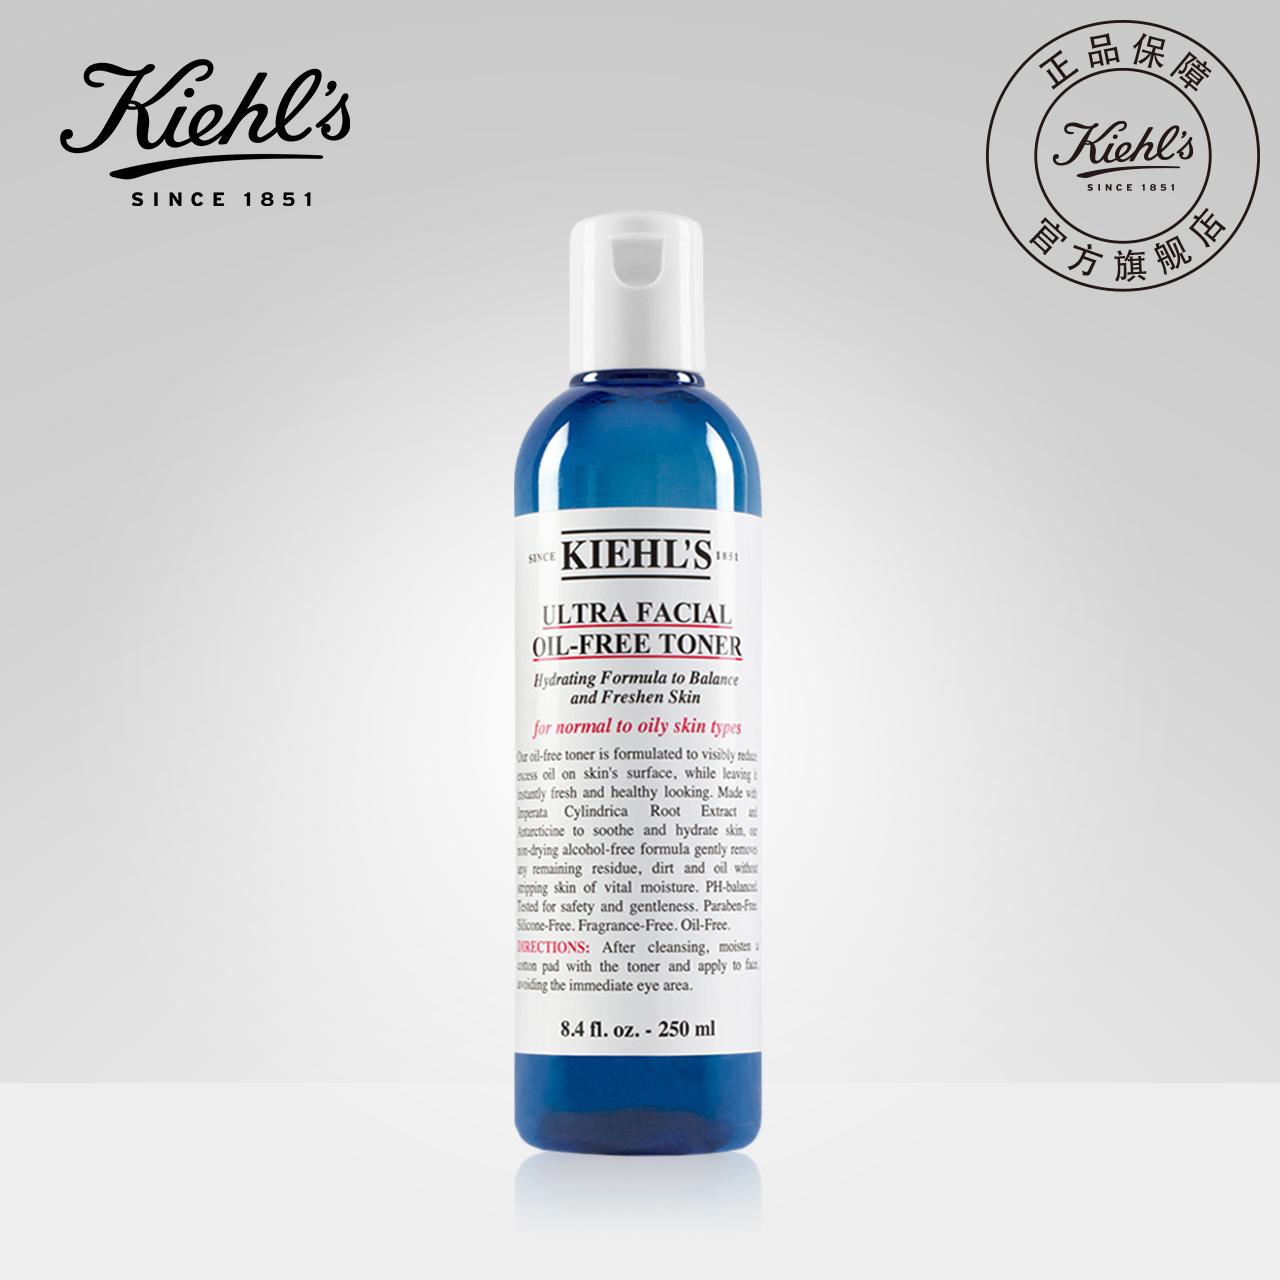 kiehl's舒润250ml平衡水油爽肤水评价好不好